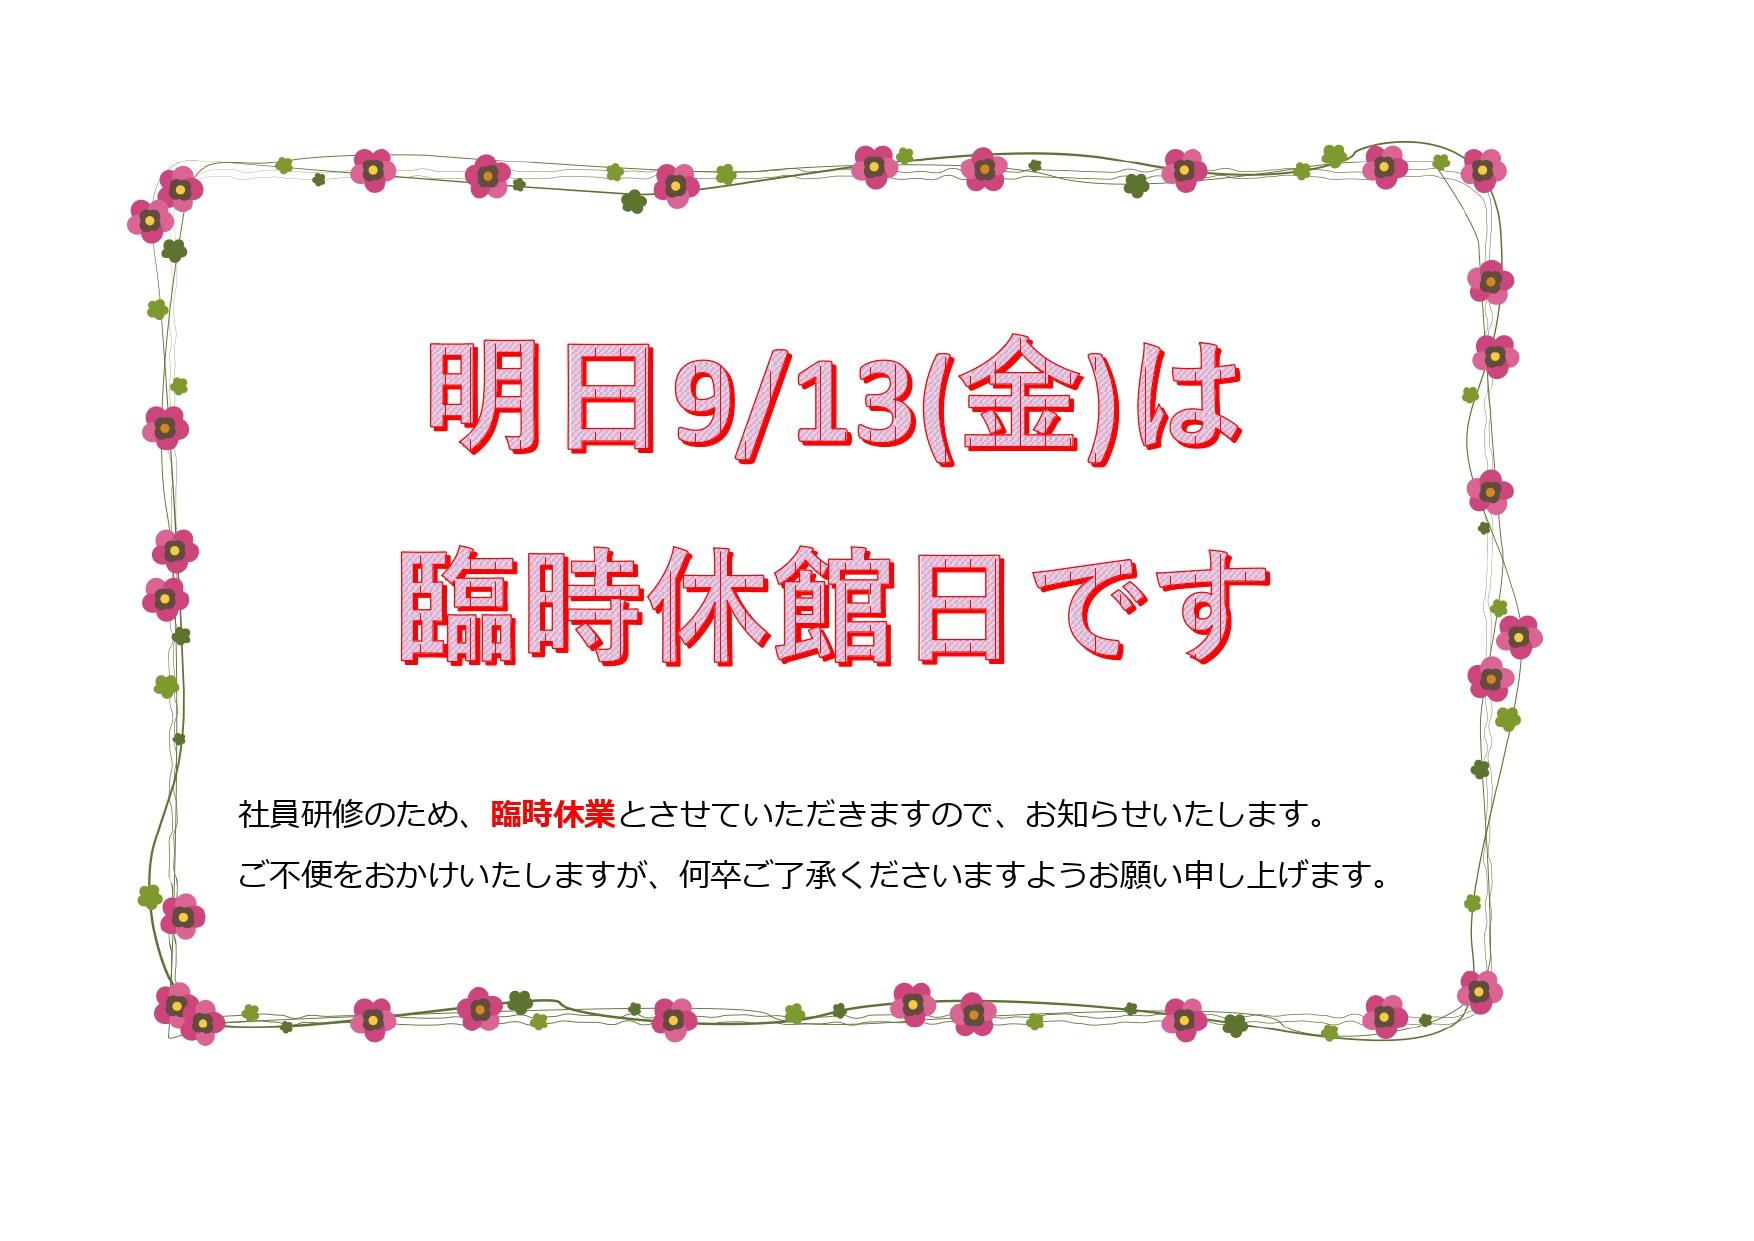 臨時休館日POP (deleted 979851efb598615f59dbe1c9f51a28dd)_page-0001 (1)